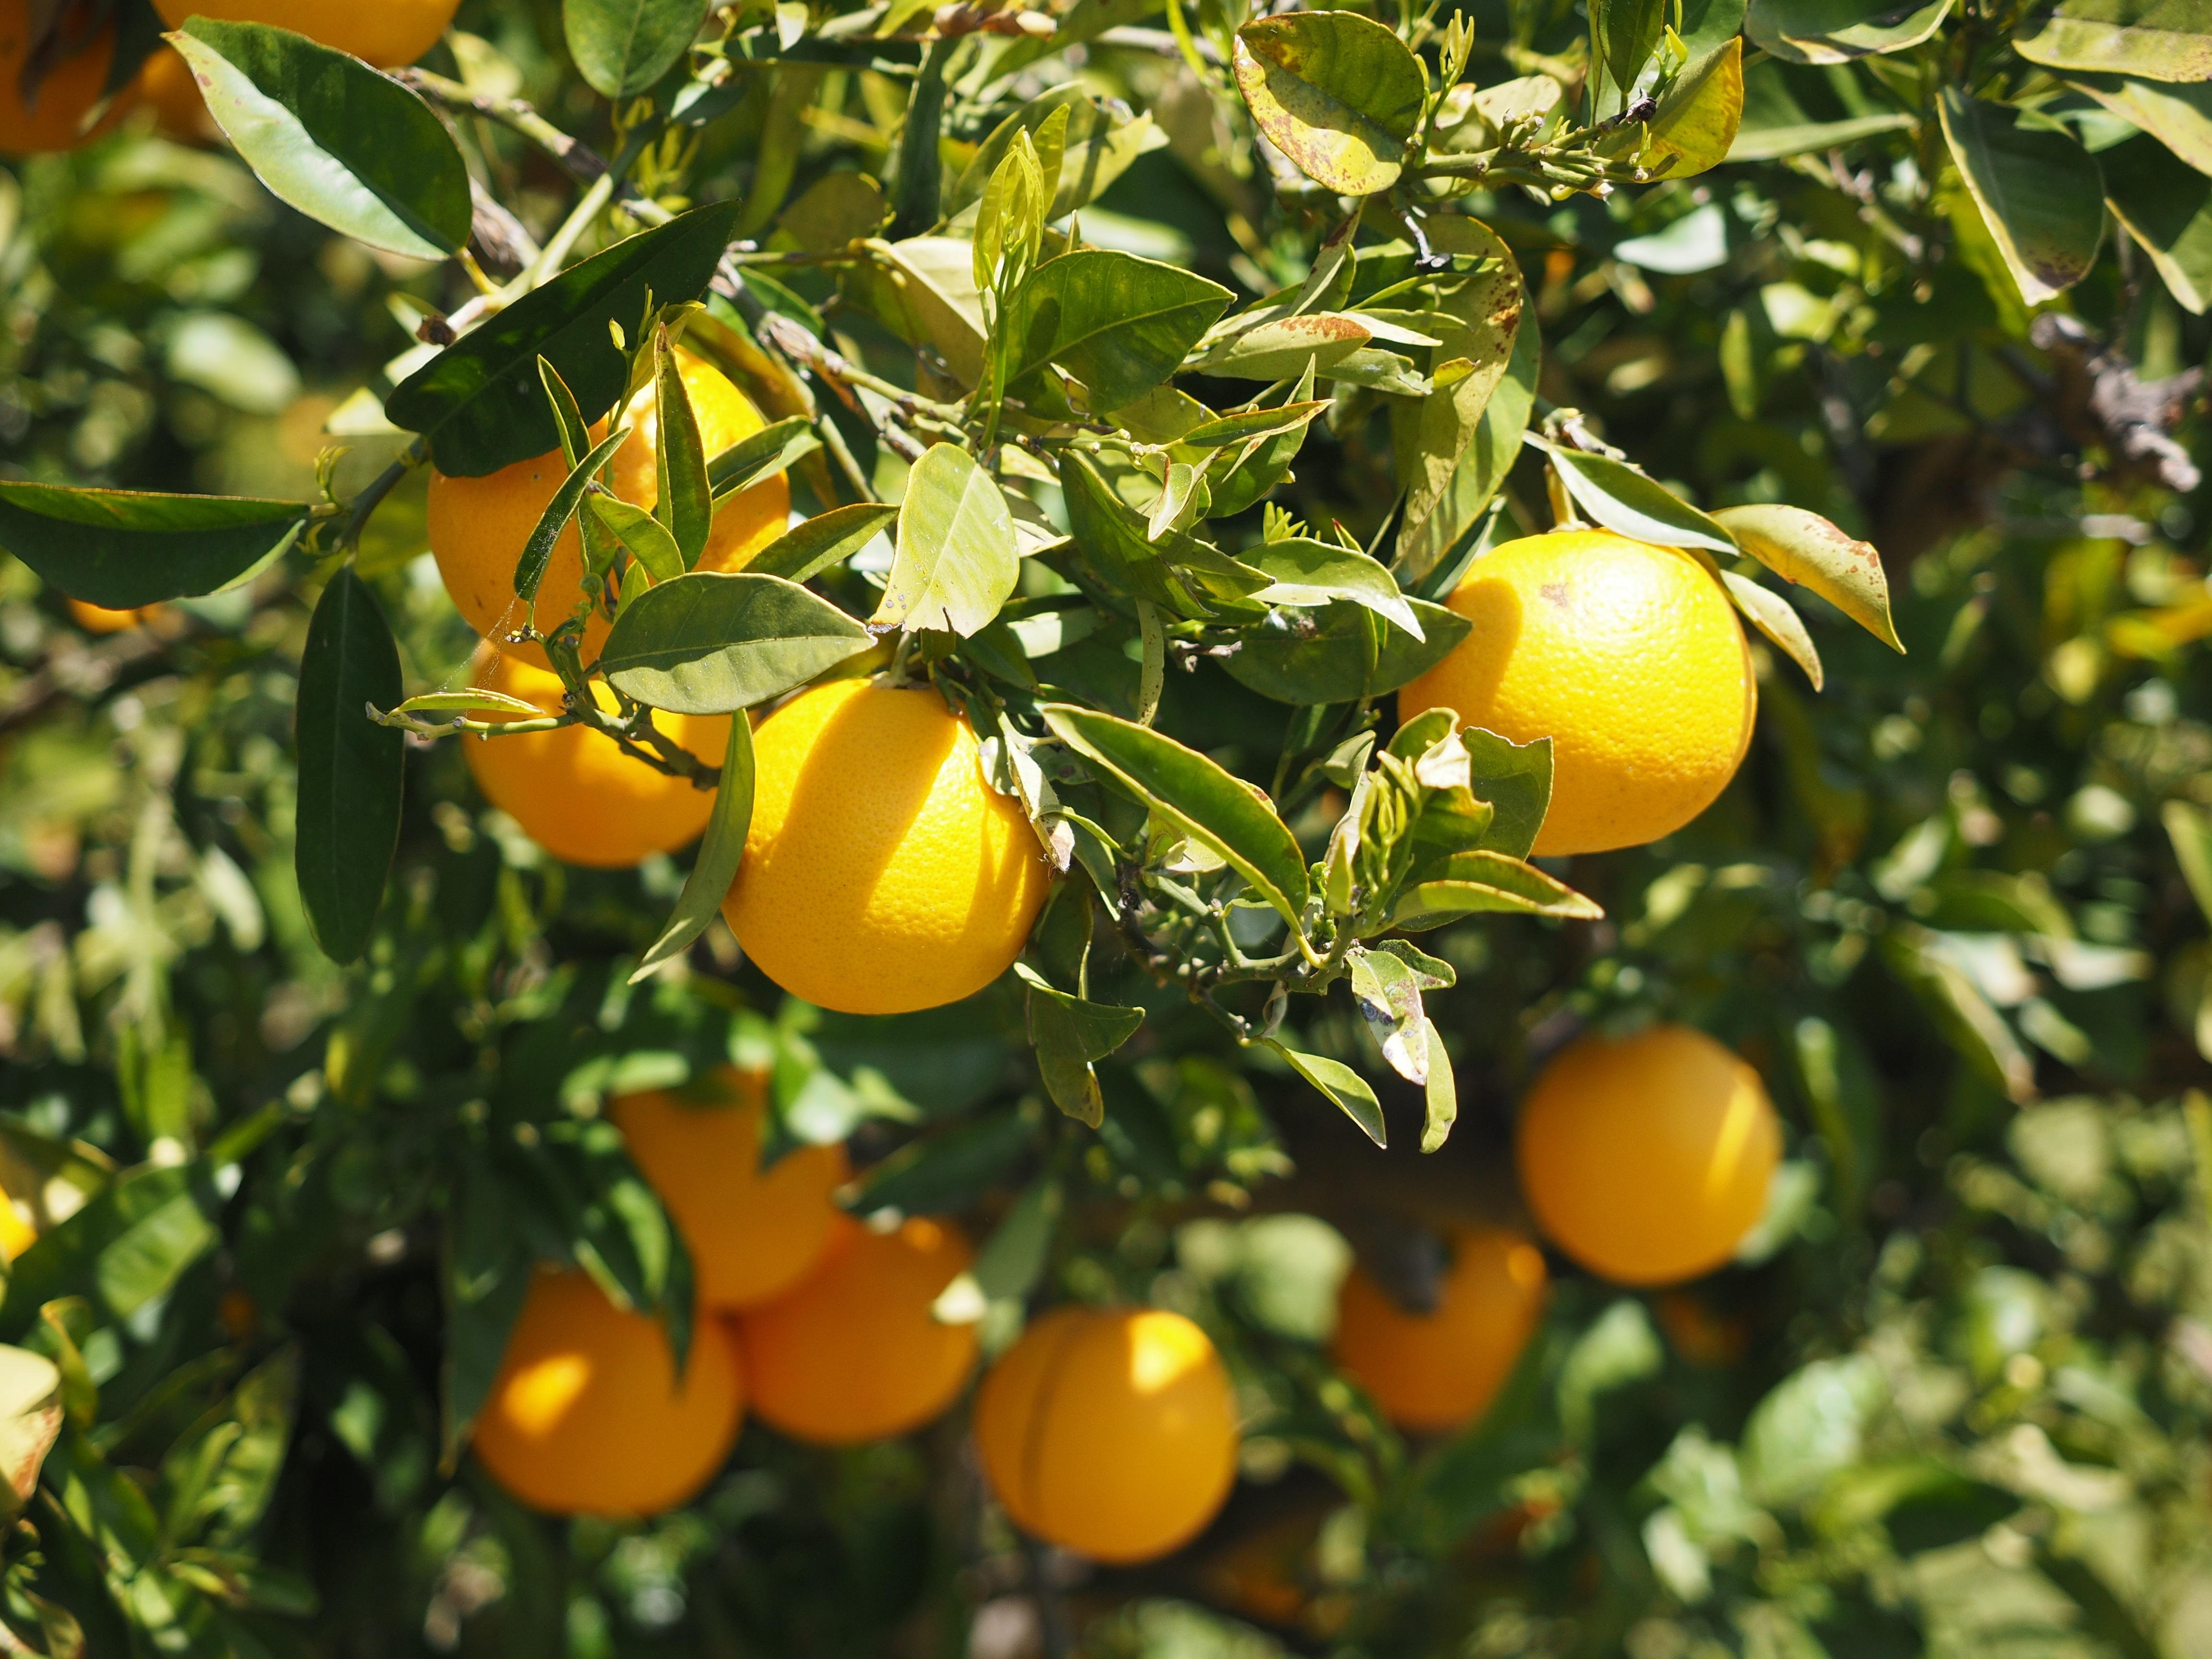 Free Images Branch Flower Summer Ripe Bush Foliage Orange Tree Food Mediterranean Produce Healthy Flora Delicious Aesthetic Tropical Fruit